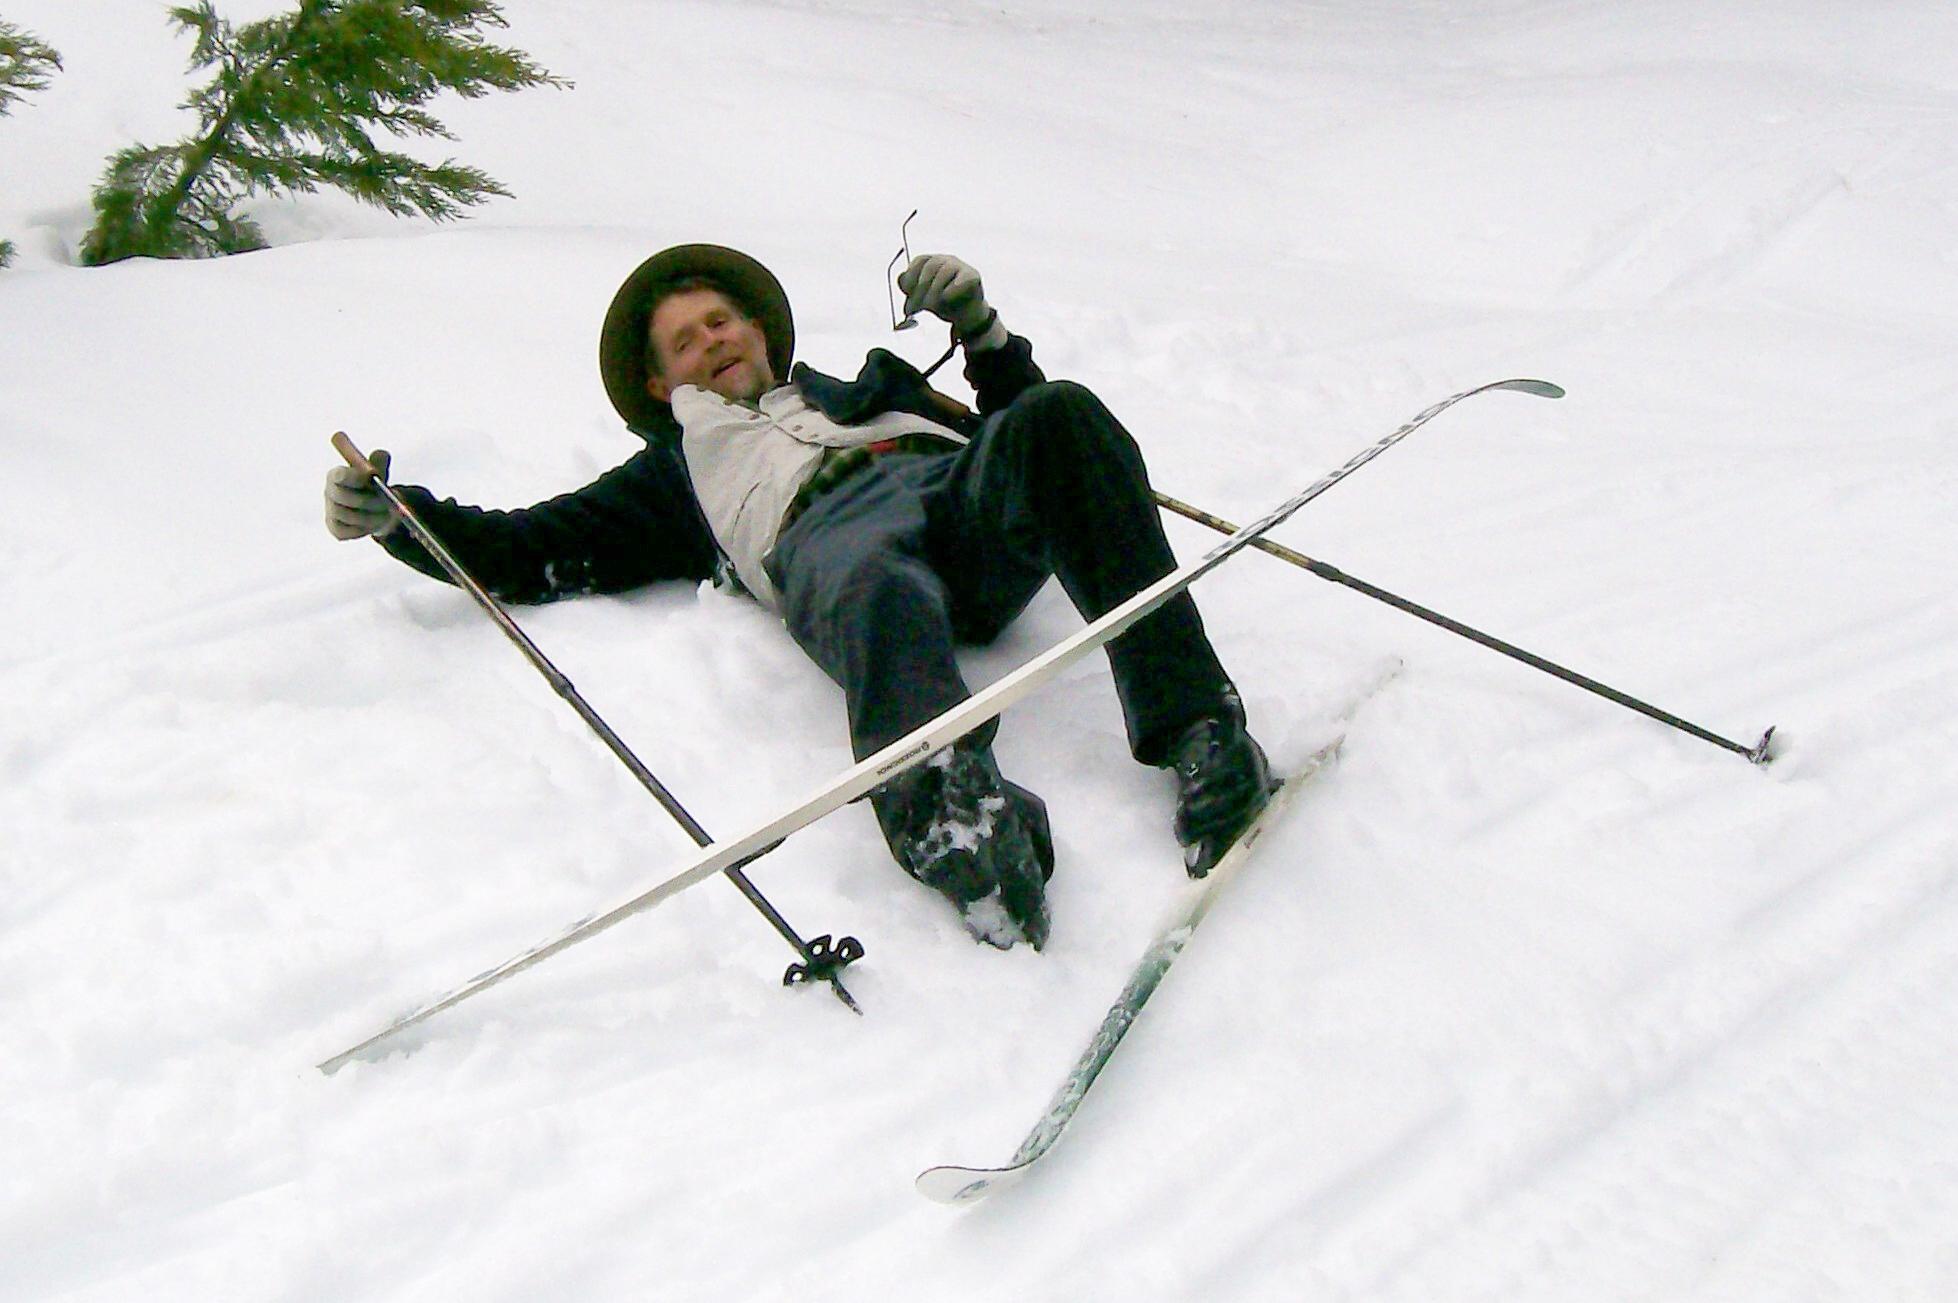 skis-fallen